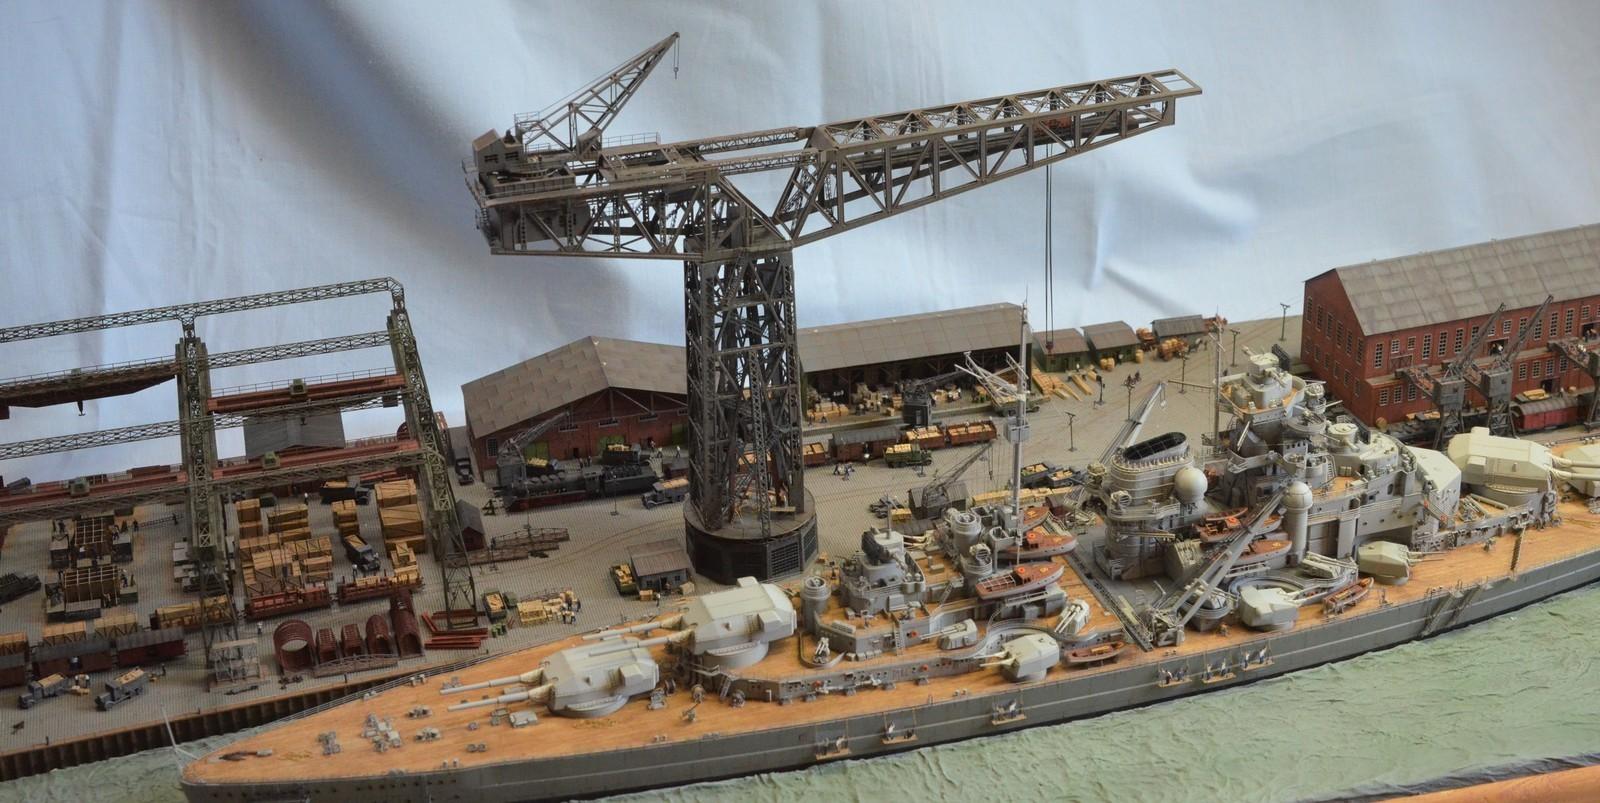 Grande grue 250 t port de Hambourg et Bismarck Revell au 1/350 - Page 11 YOzJGu